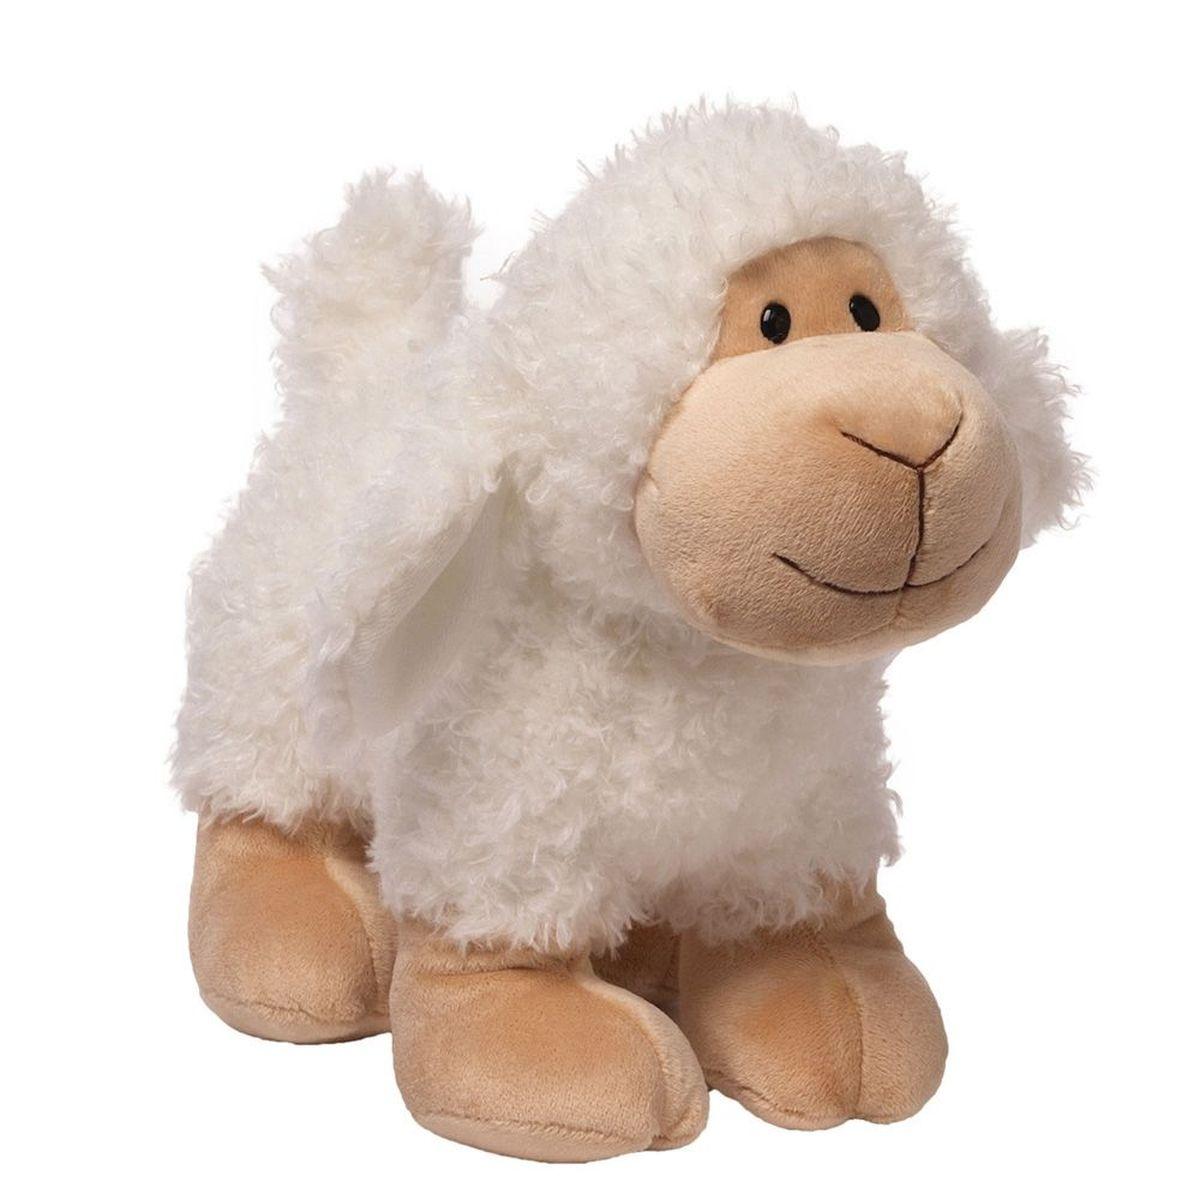 Gund Мягкая игрушка Wooly 23 см